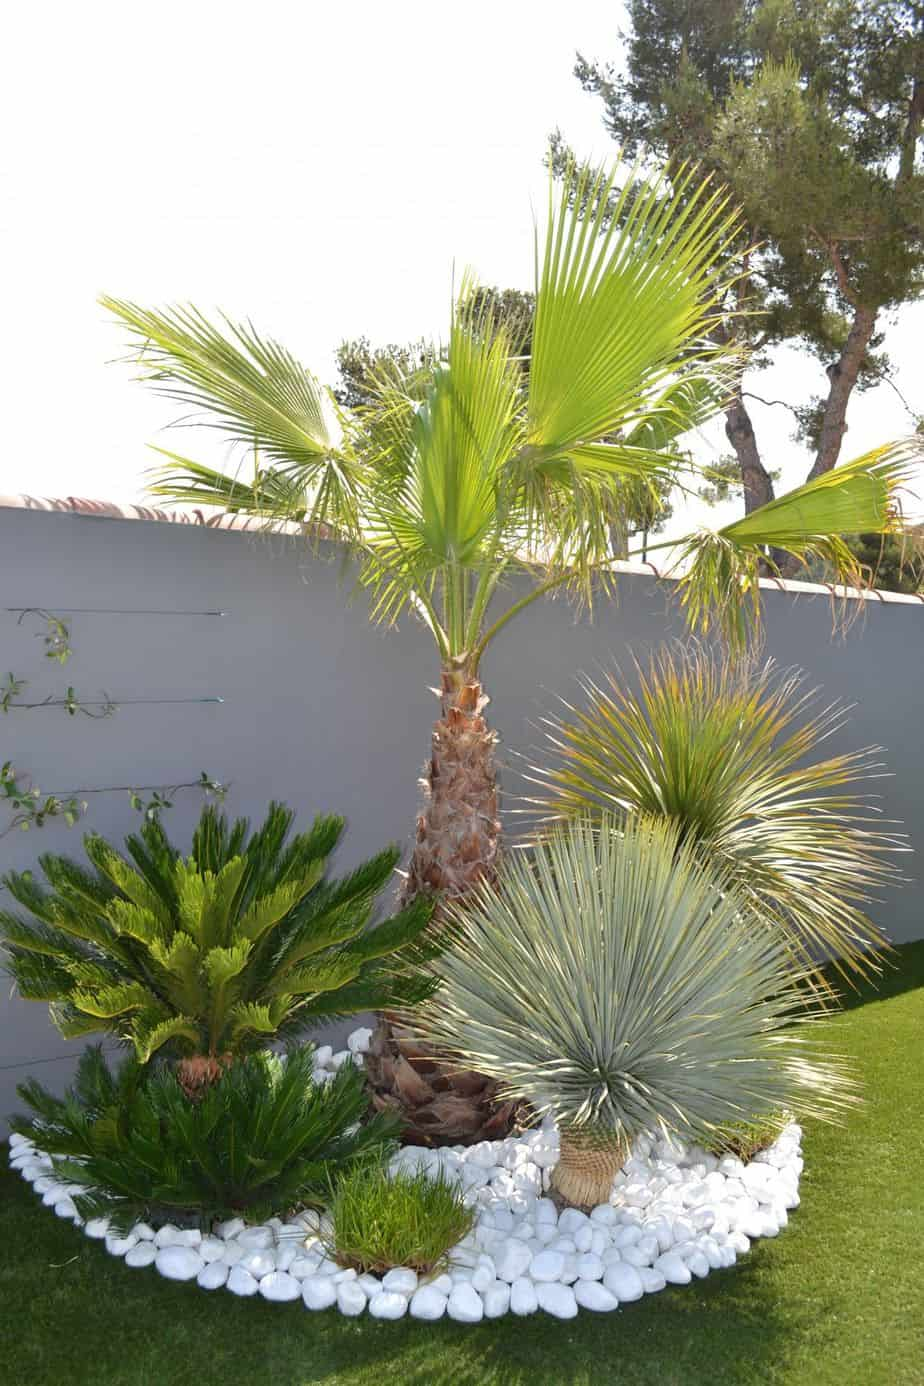 palmier piscine